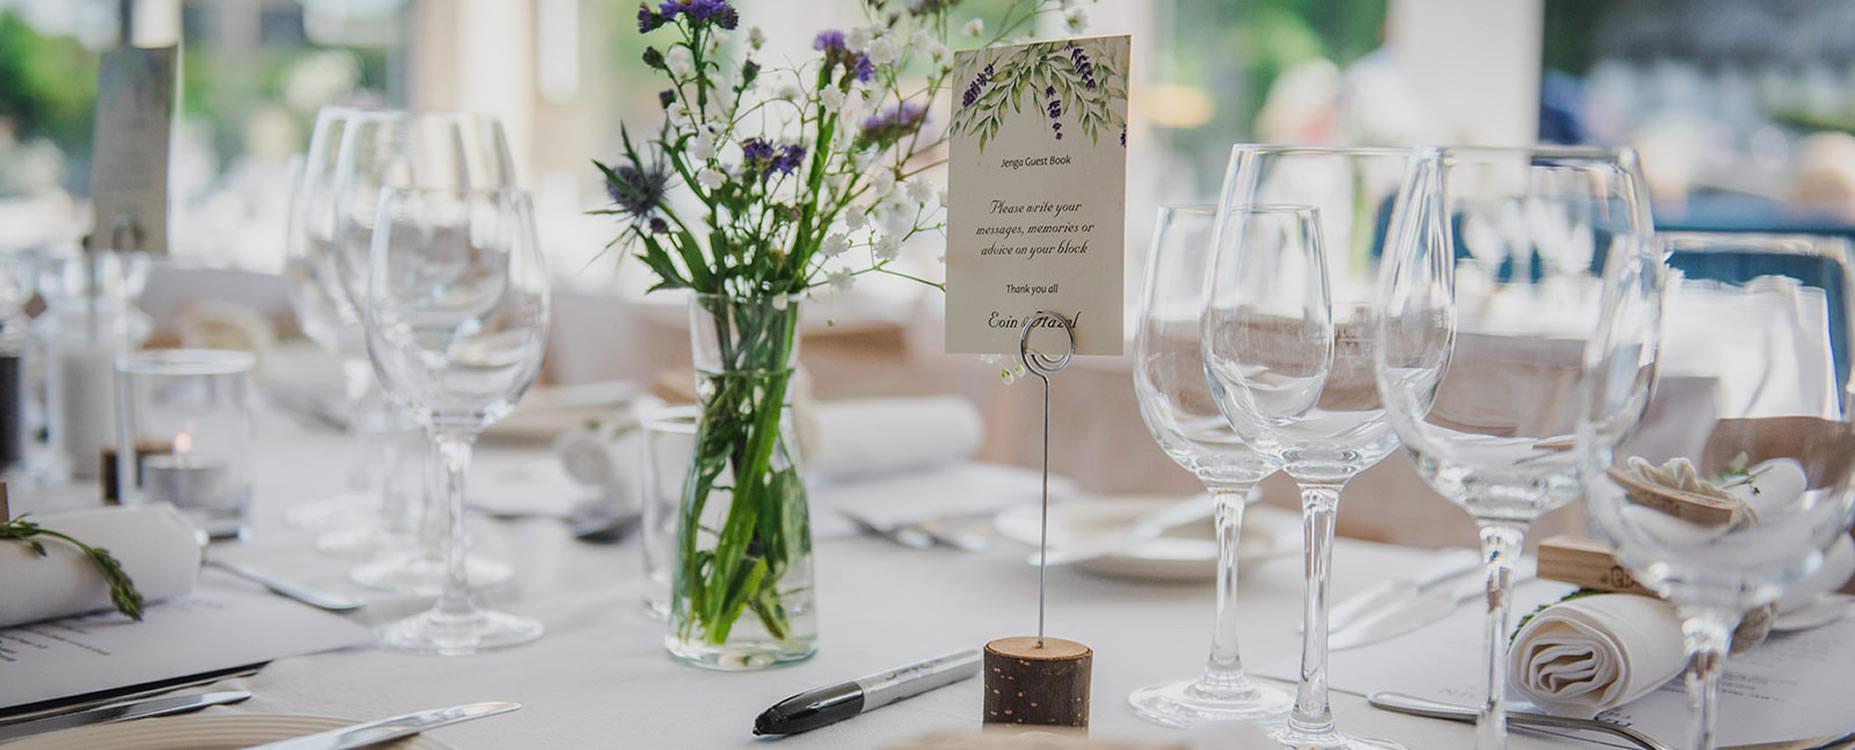 weddings-slider3